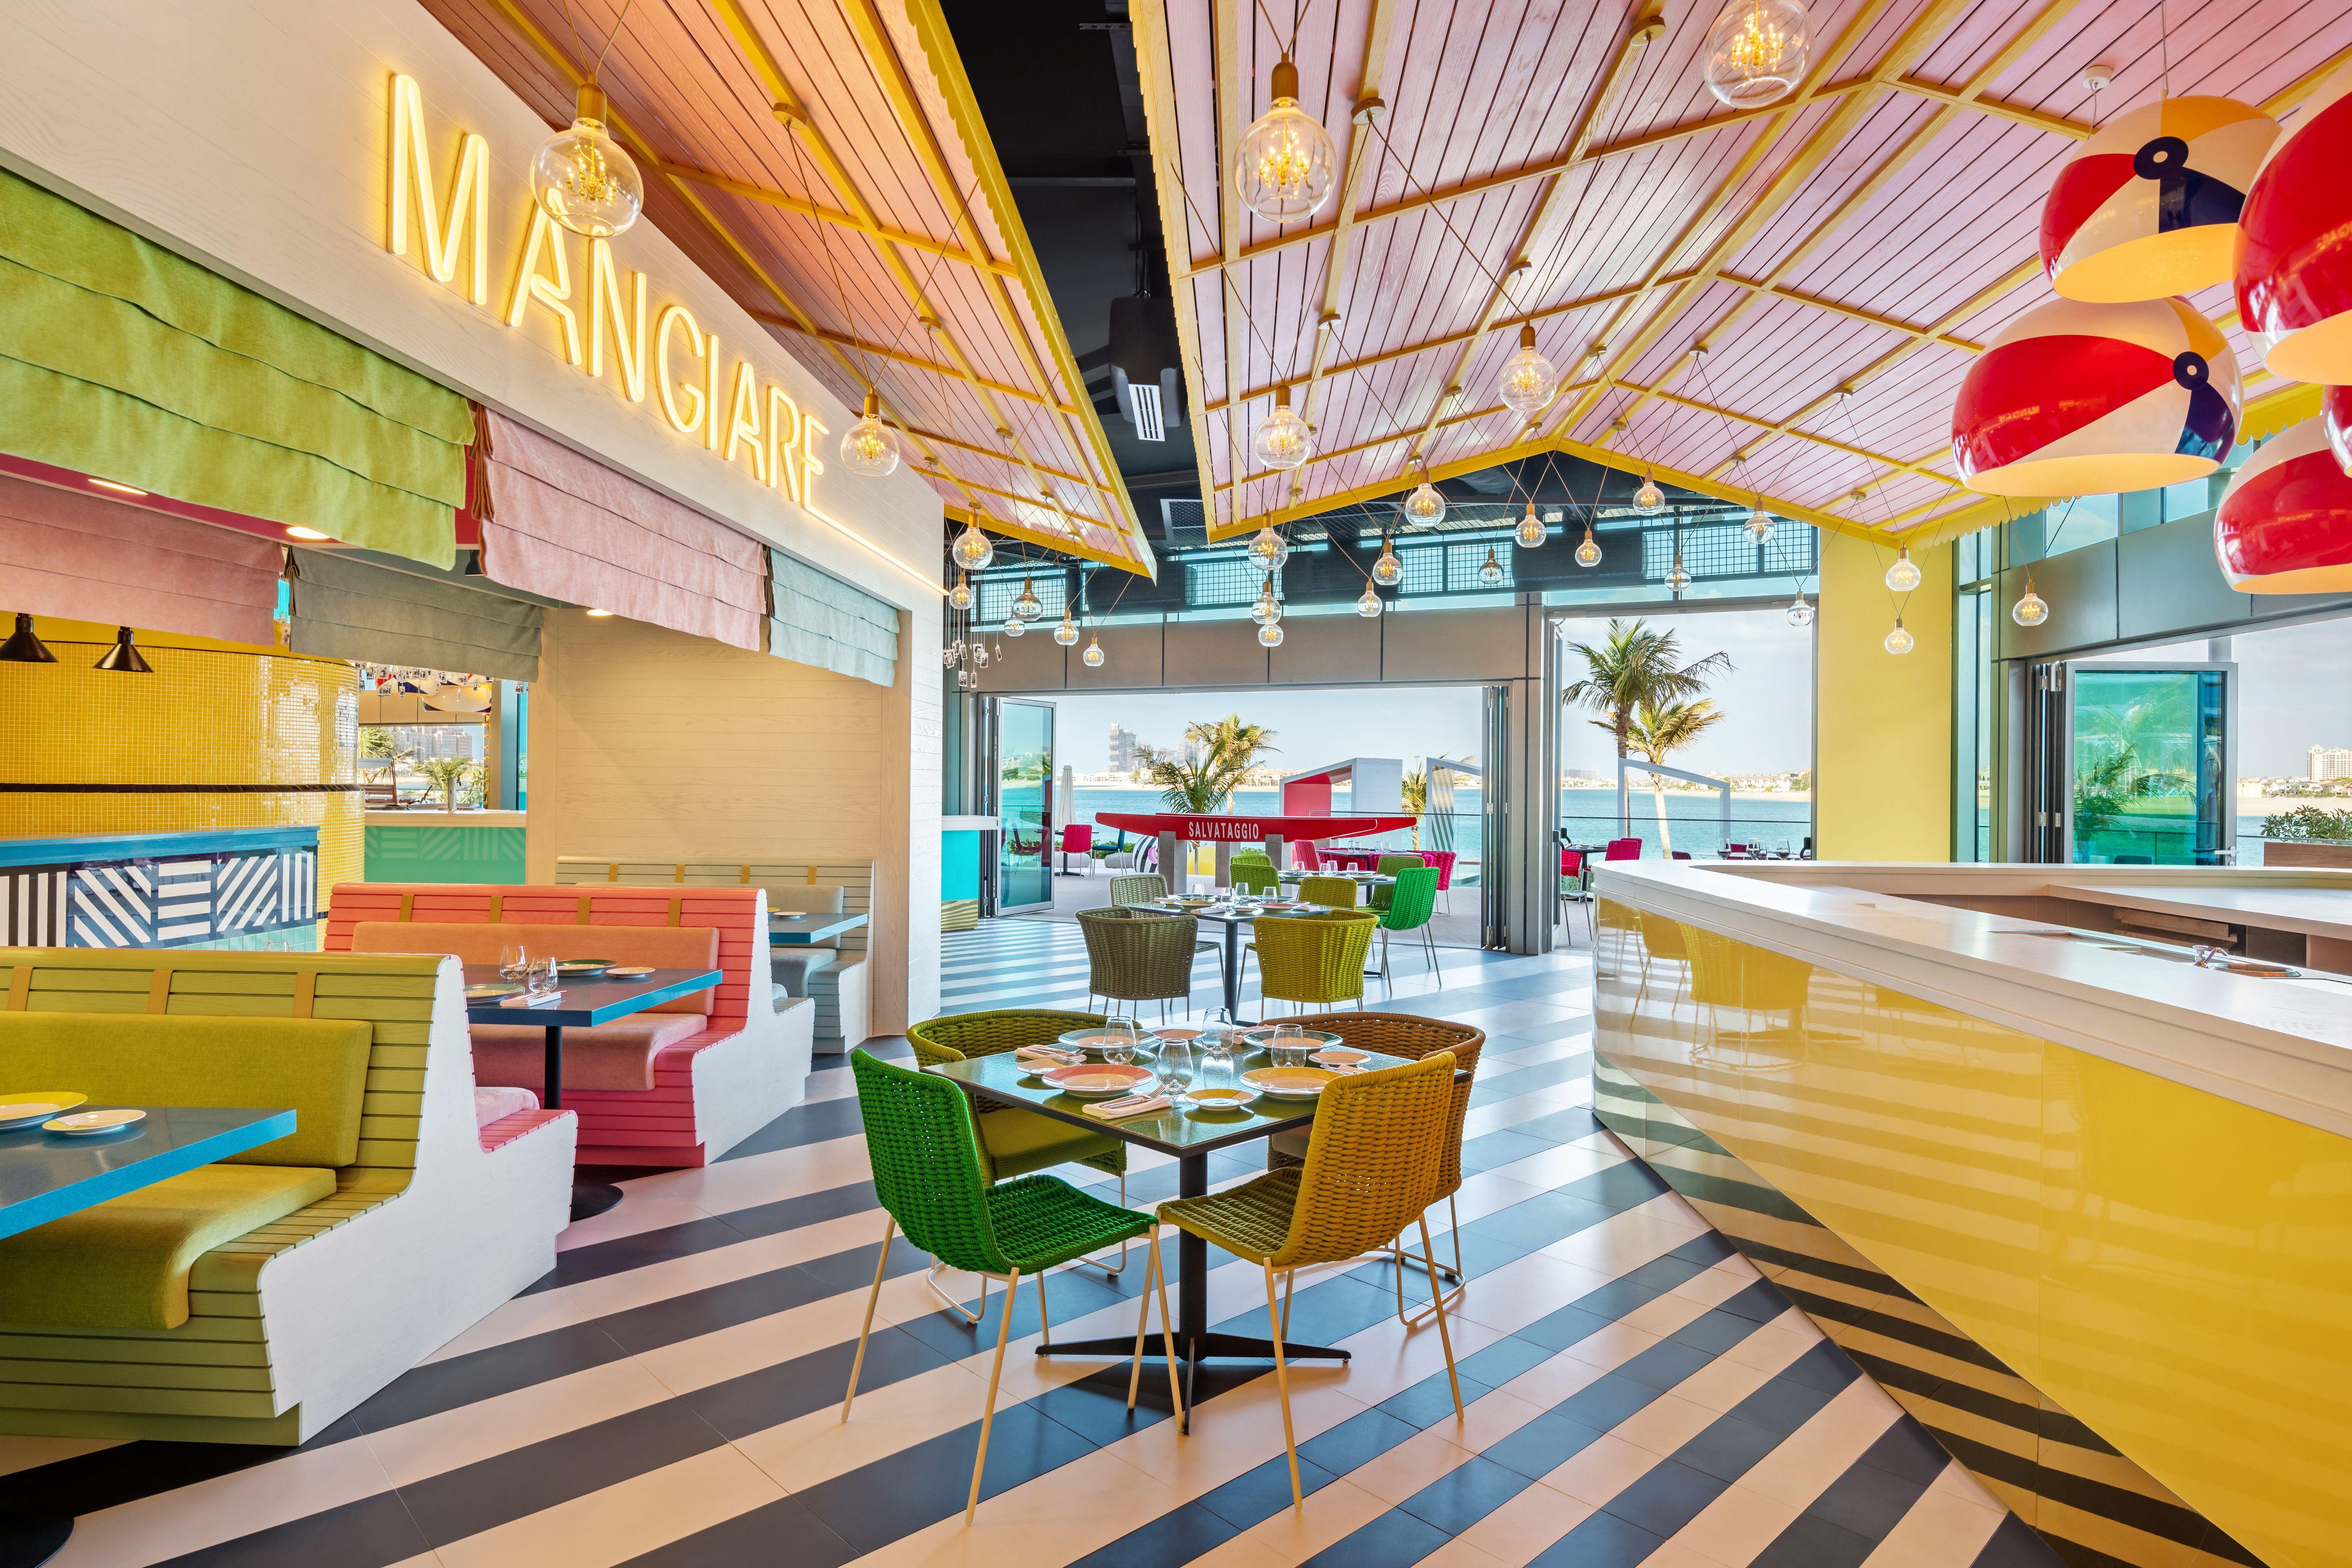 Massimo Bottura's New Restaurant in Dubai is a Riff on the Italian Riviera